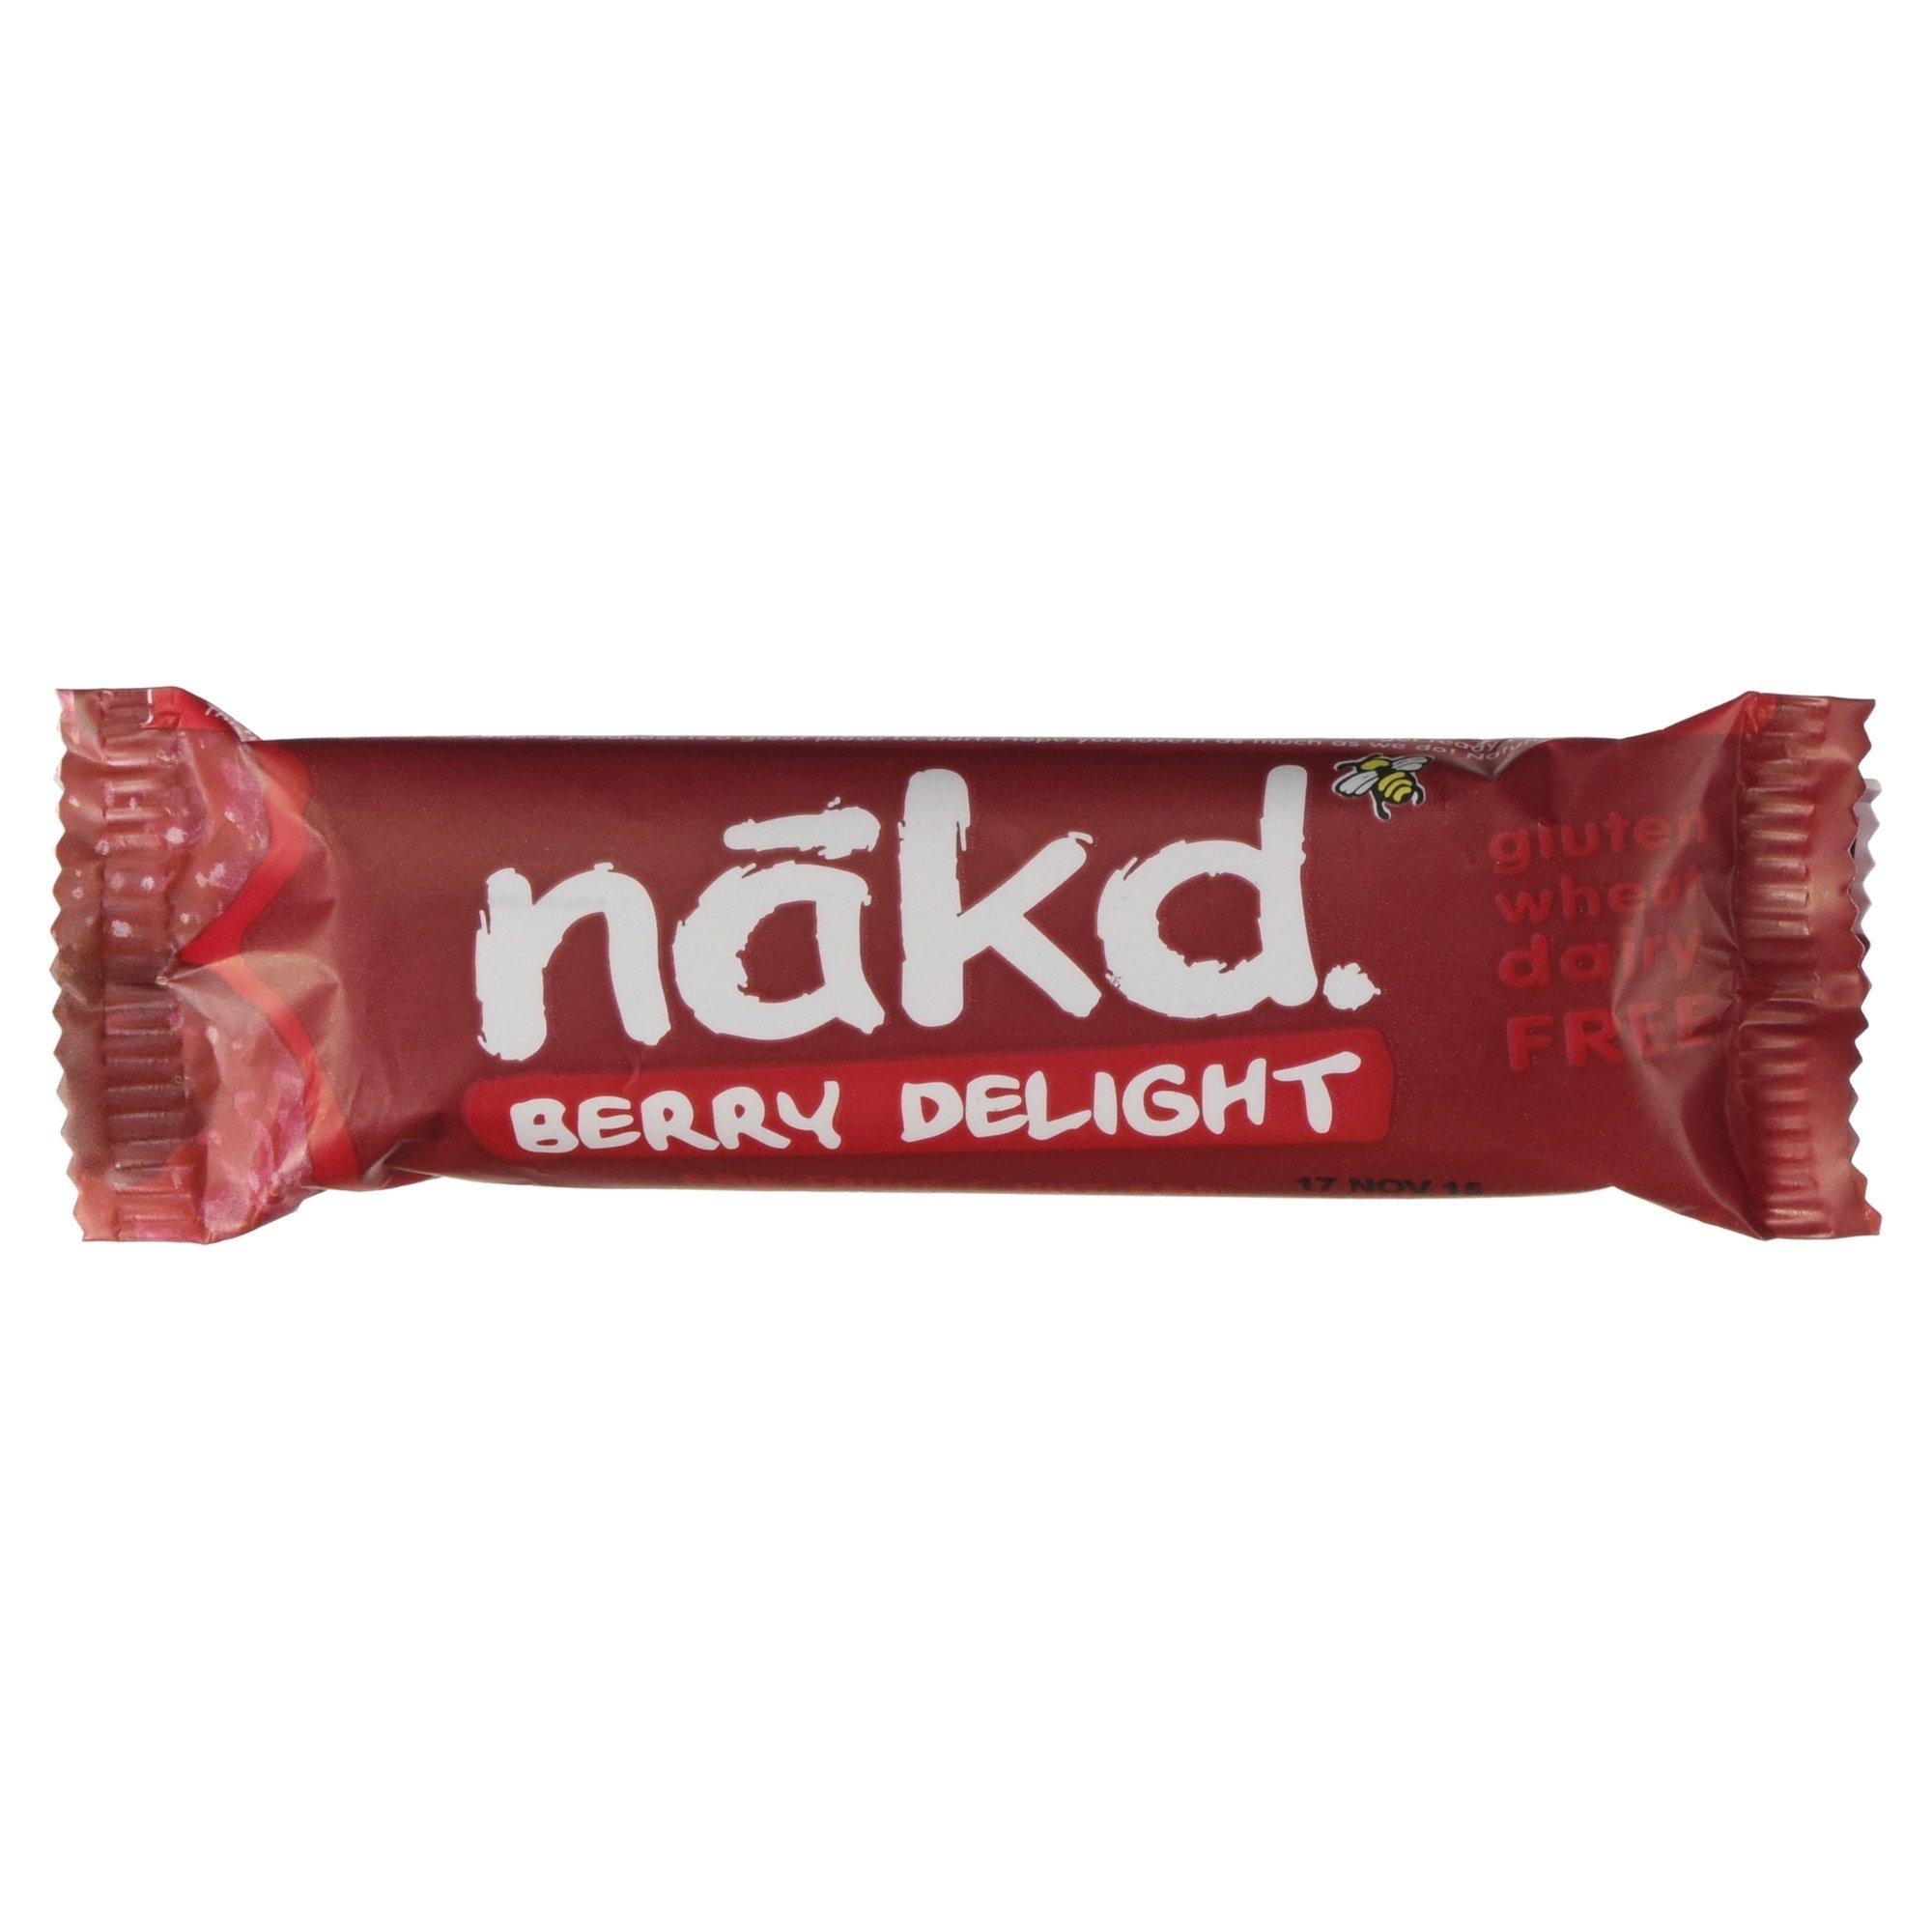 N?kd - Berry Delight Bar - 35g